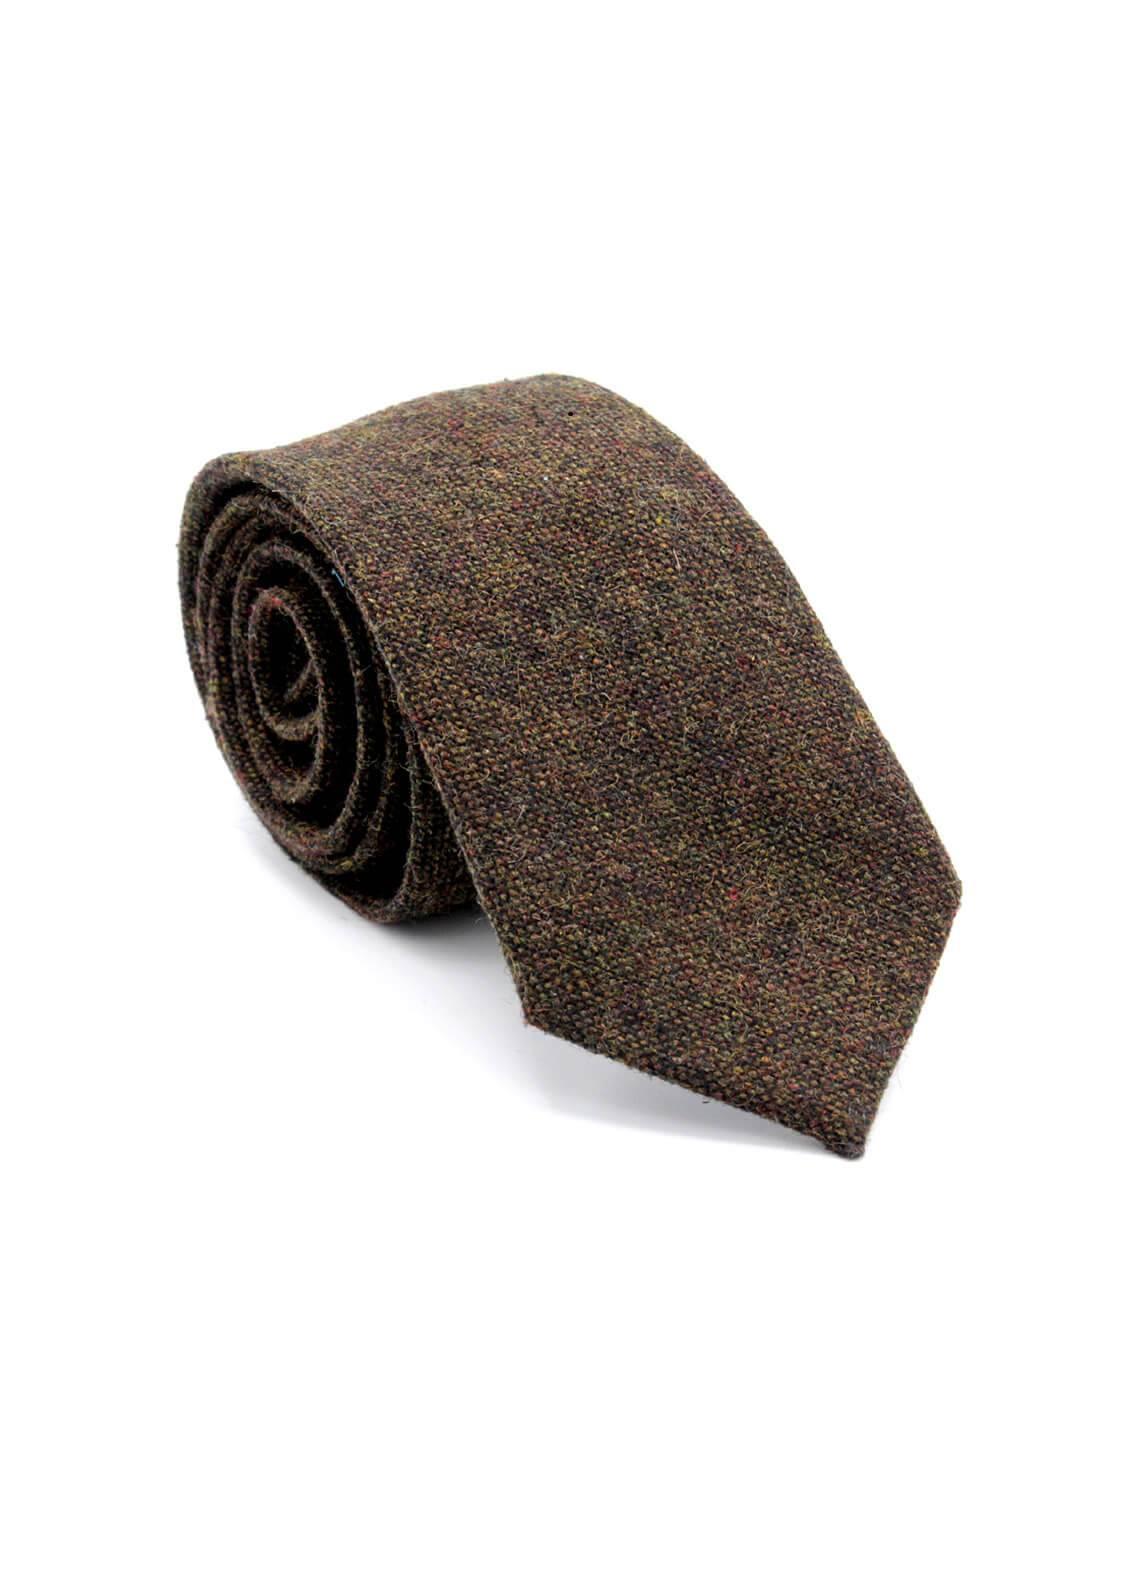 Skangen Narrow Wool Neck Tie Neck Tie SKTI-W-013 -